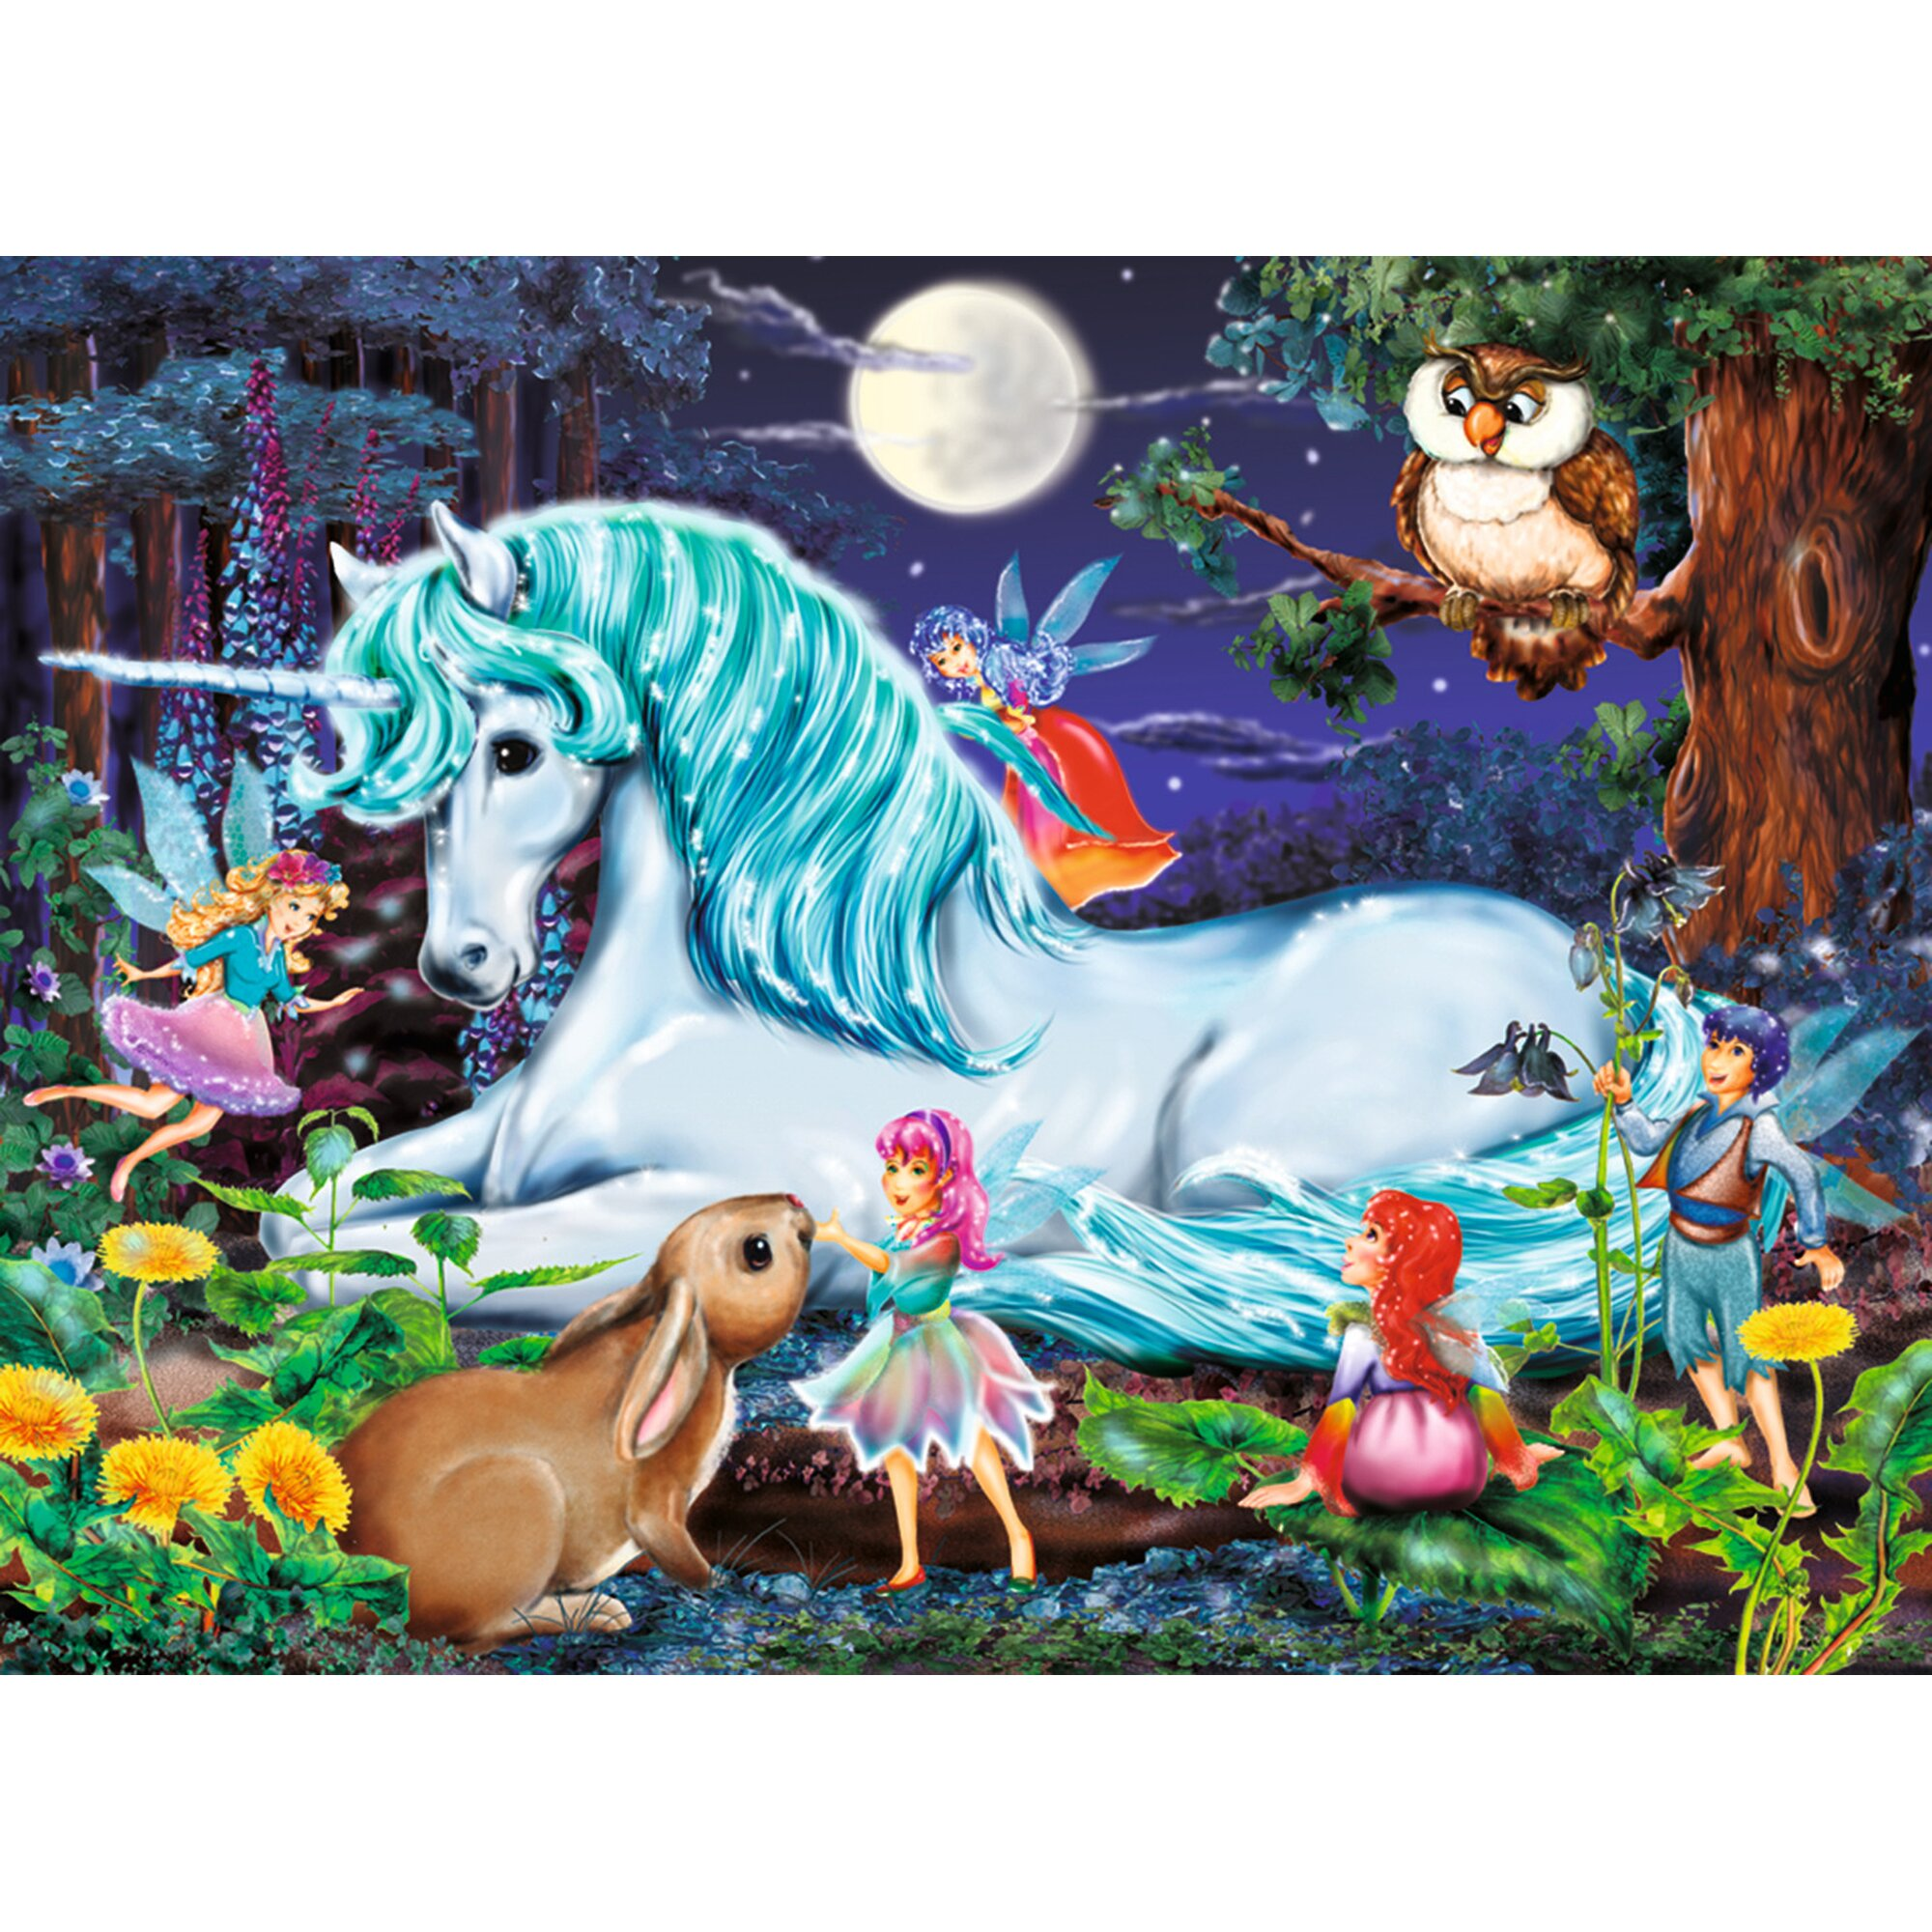 ravensburger-kinderpuzzle-im-xxl-format-100-teile-im-zauberwald